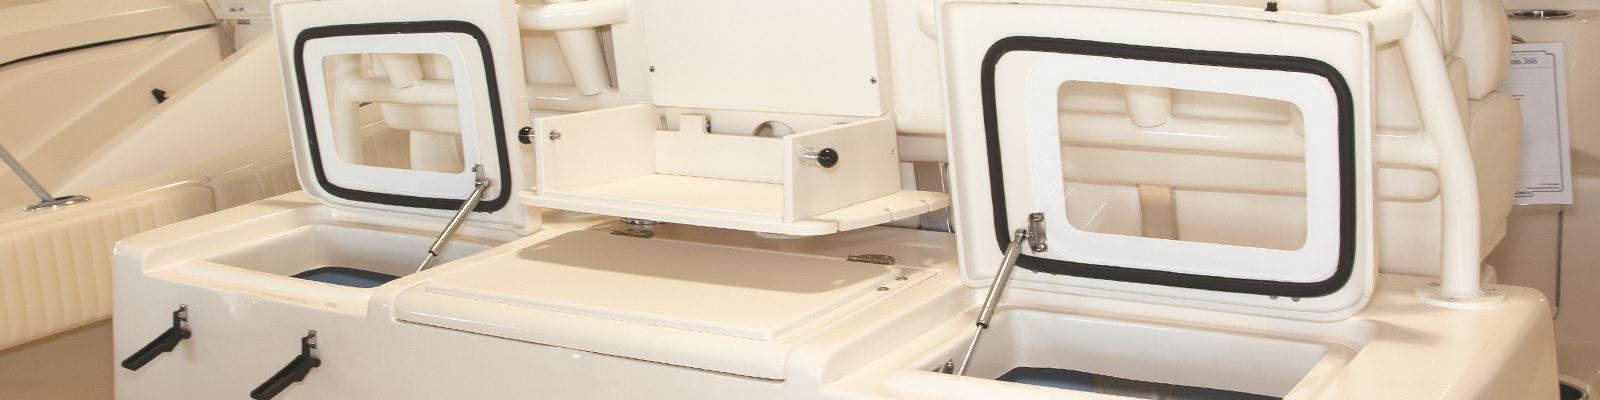 trim-molding-vinyl-molding-v25-9543